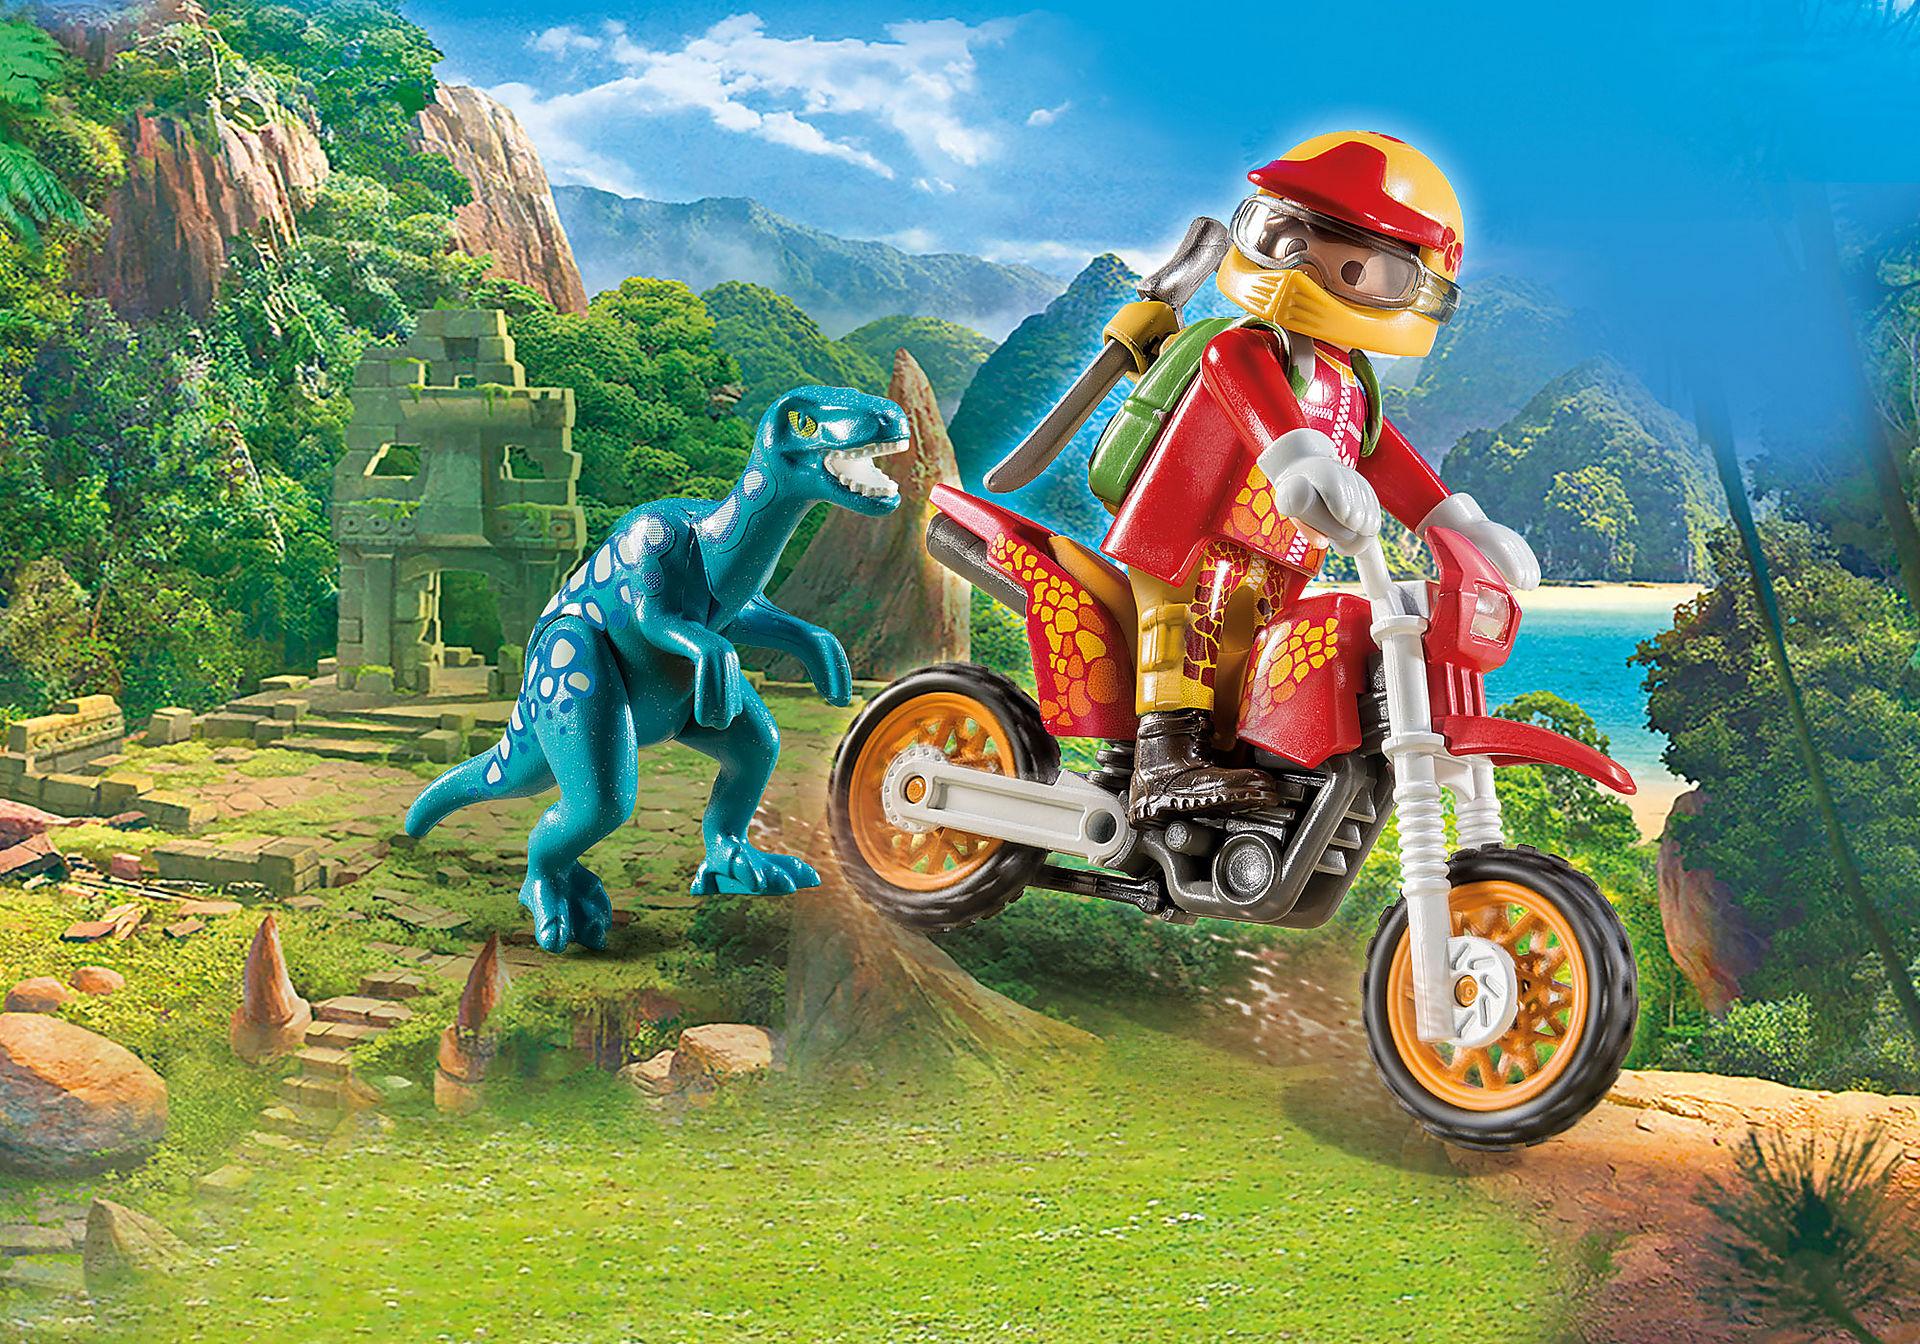 9431 Motocross-Bike mit Raptor zoom image1